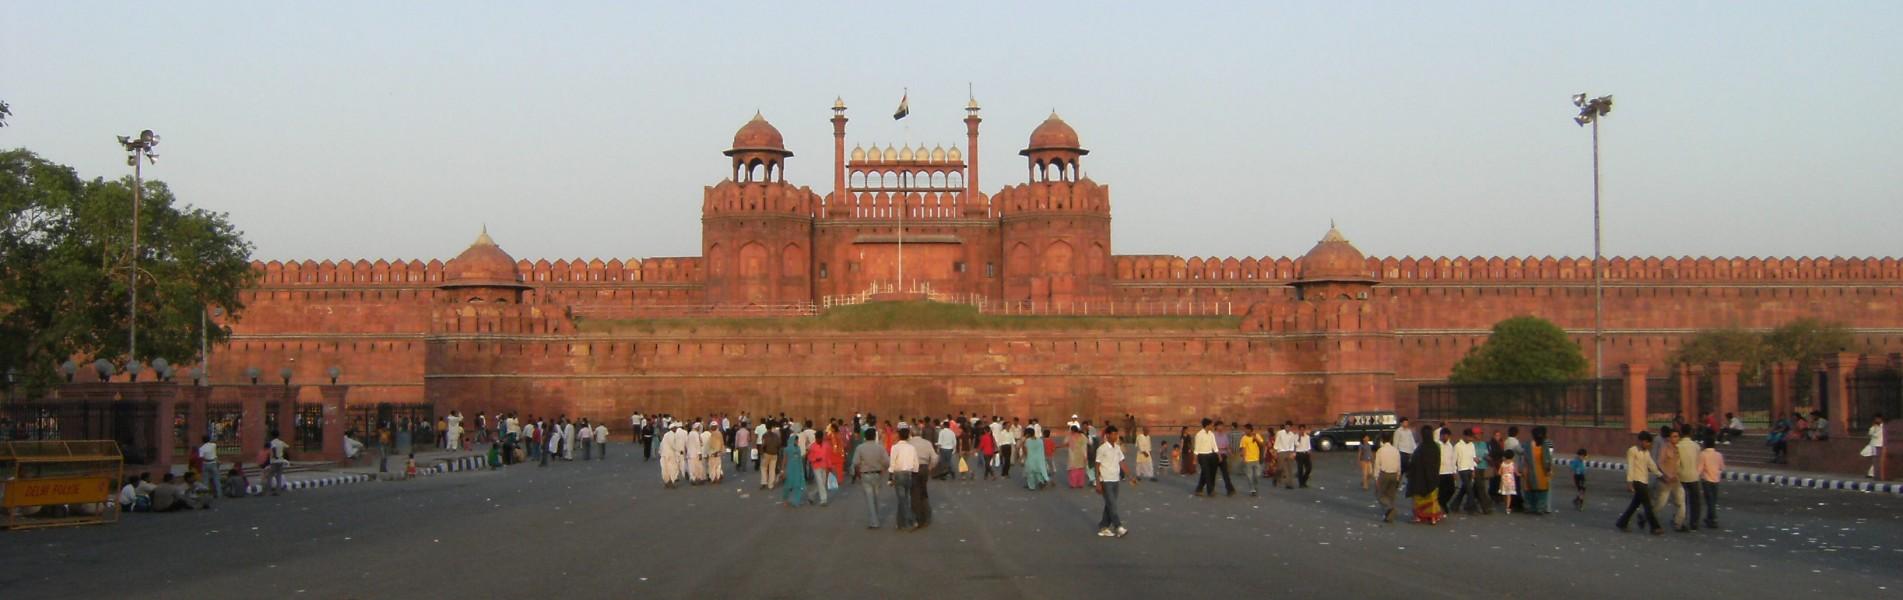 Arrive & Delhi Sightseeing